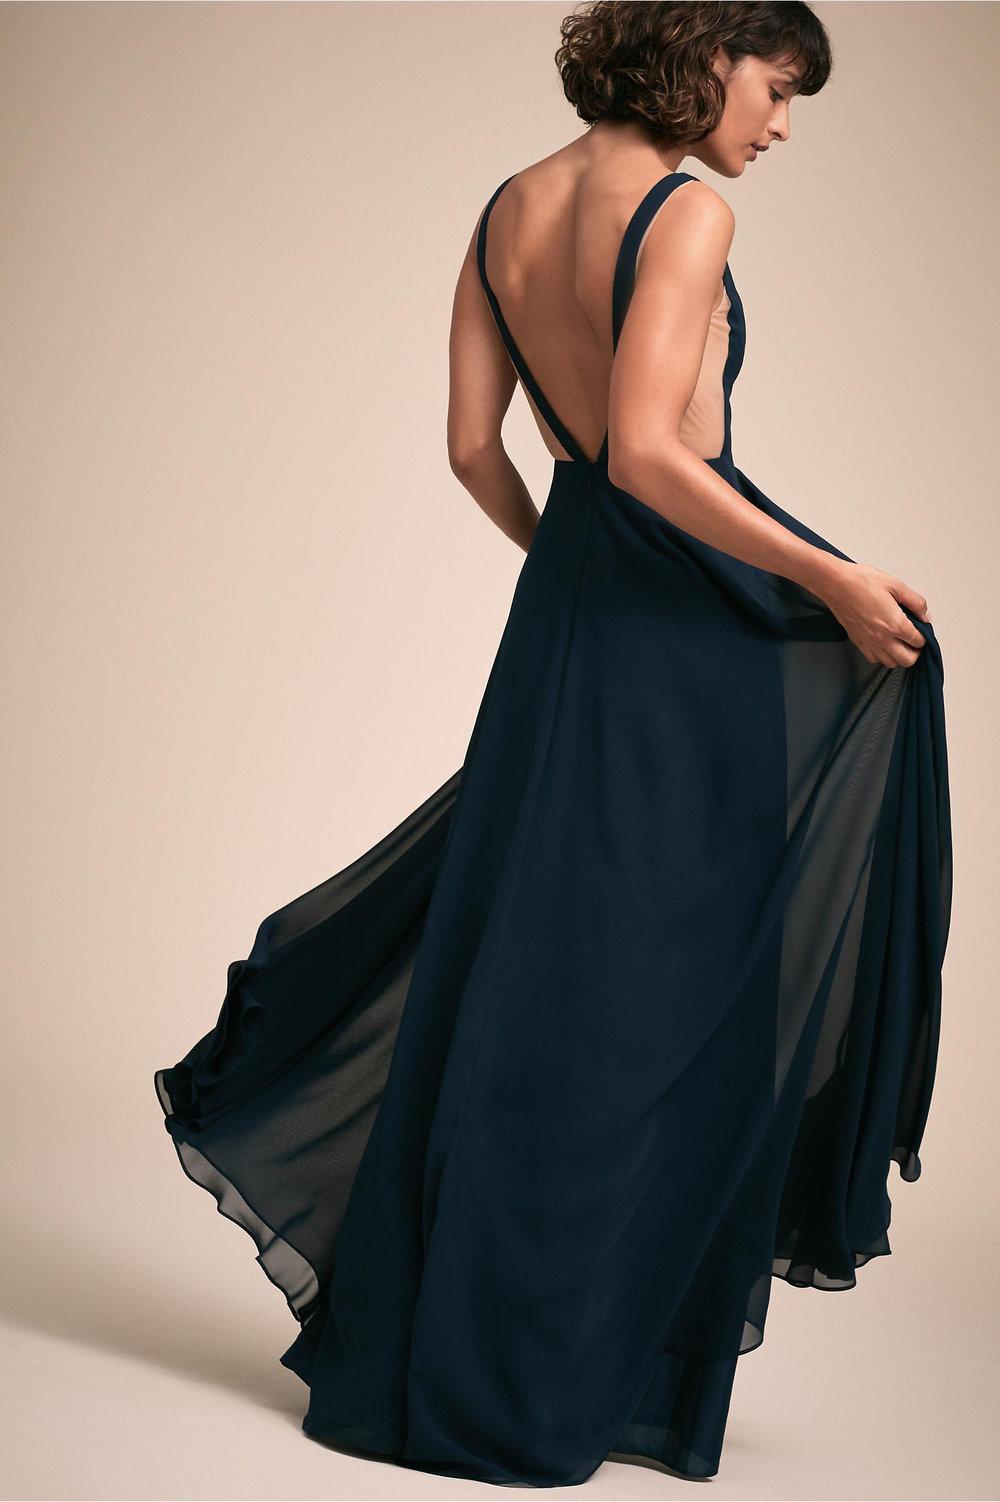 Colby Wedding Dress in Navy by BHLDN